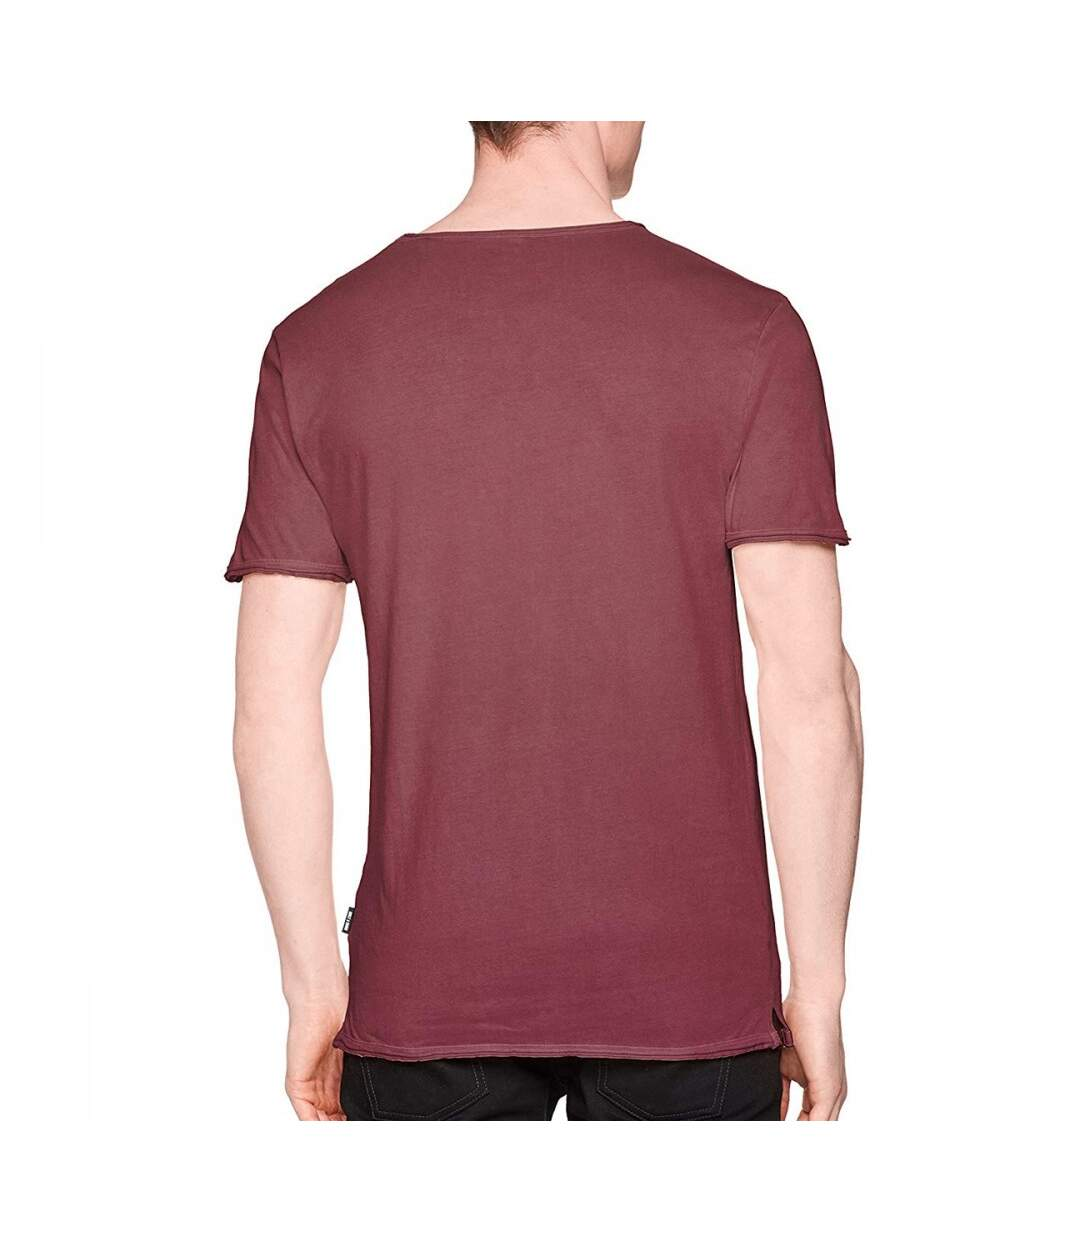 T-Shirt Bordeaux Homme Only & Sons